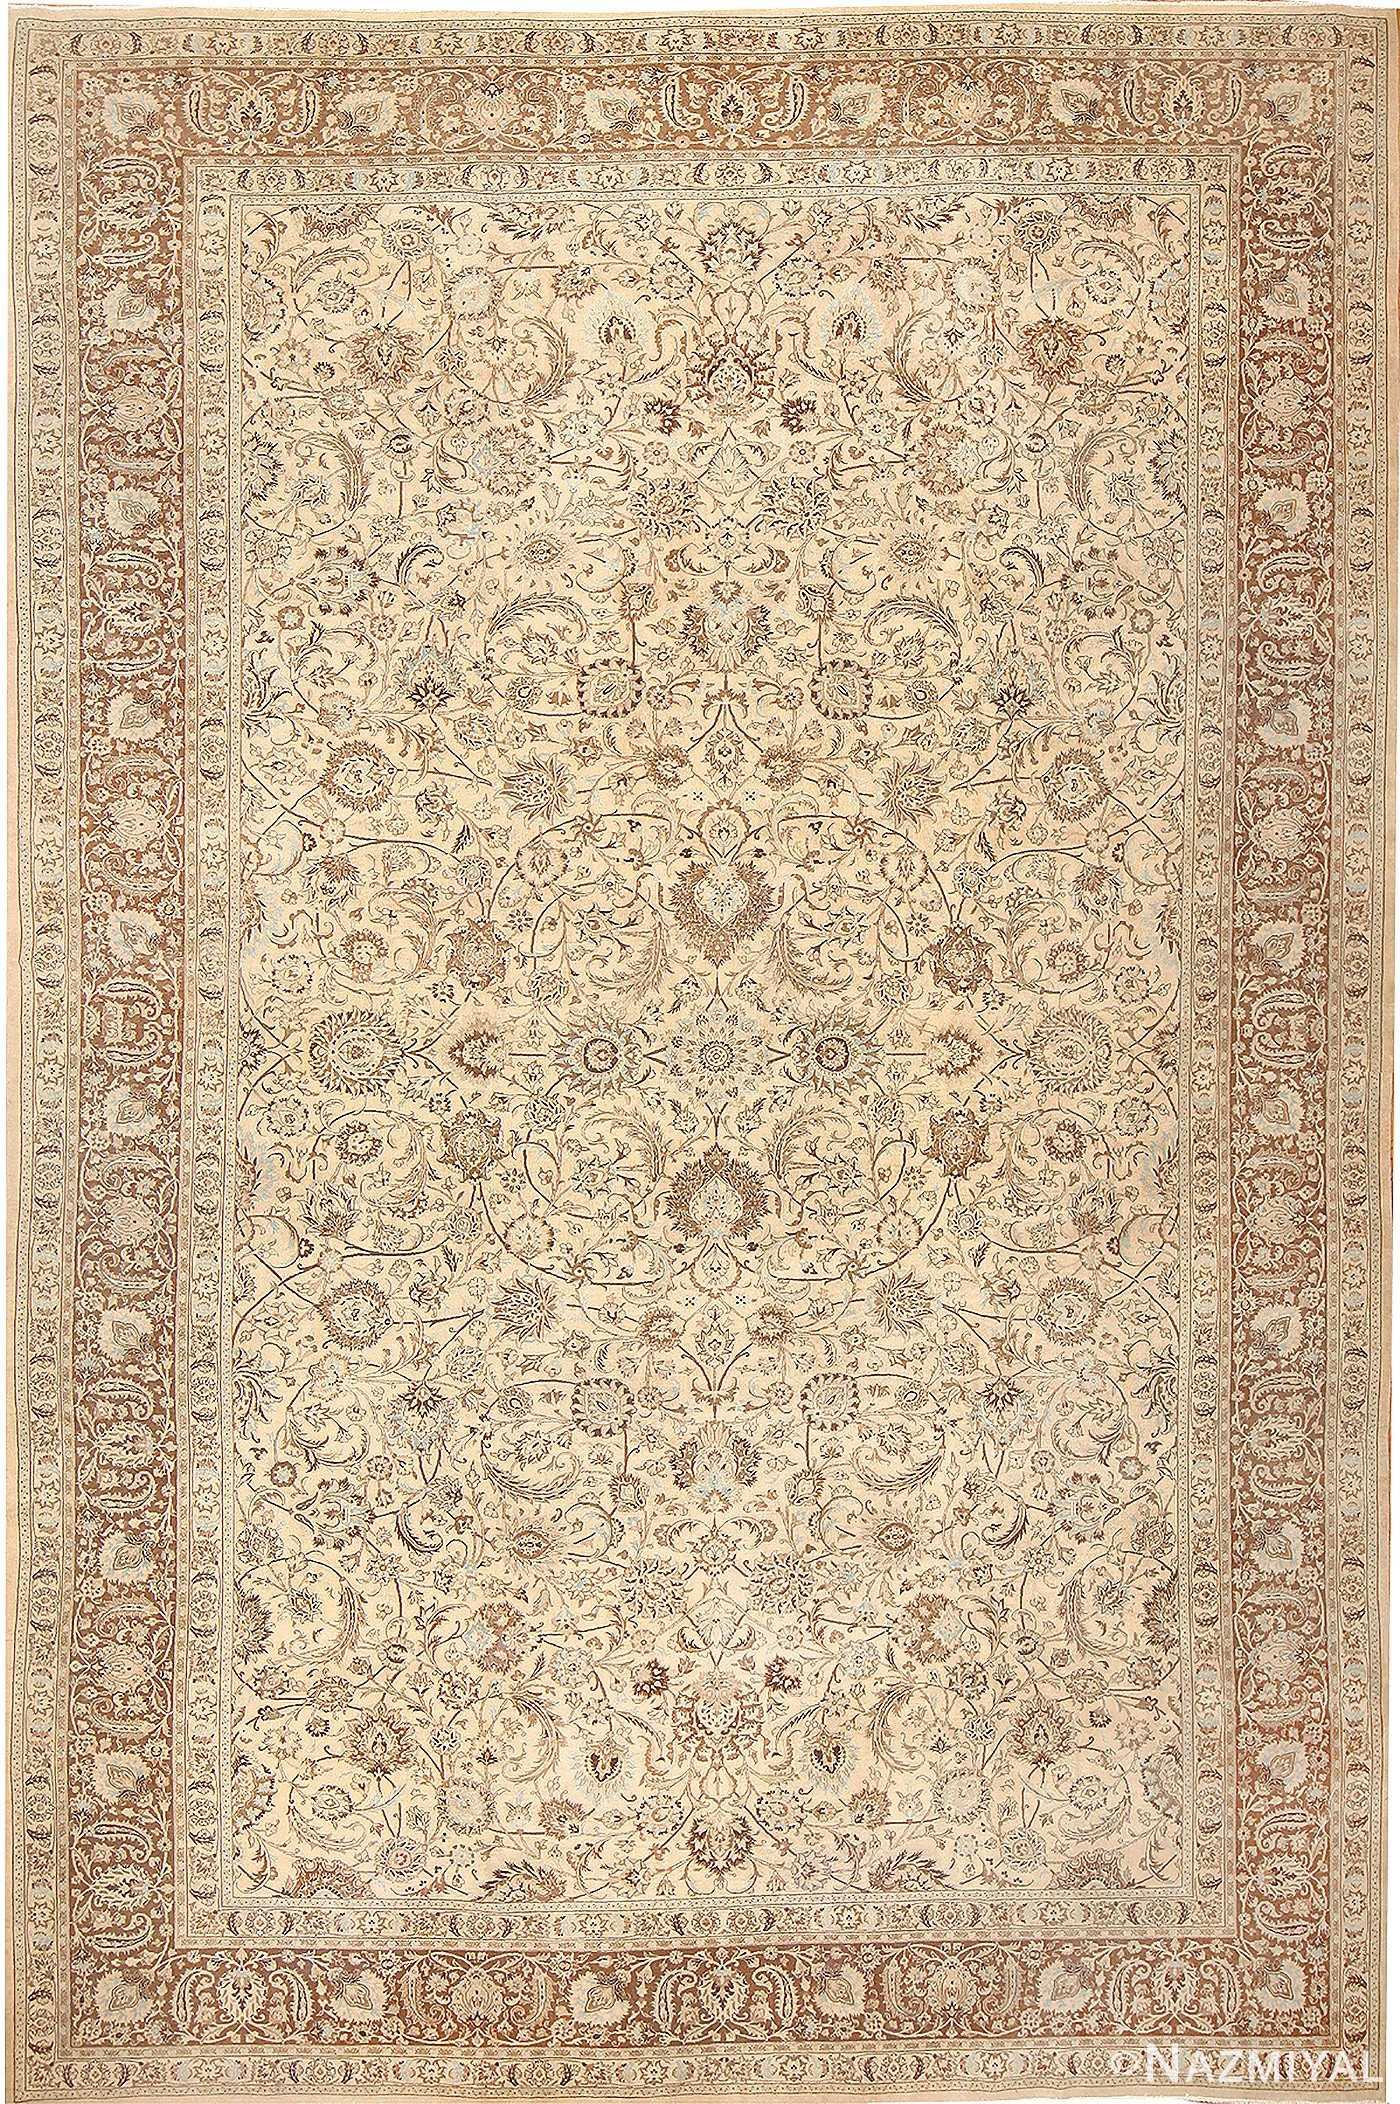 Antique Khorassan Persian Rug #41975 Nazmiyal